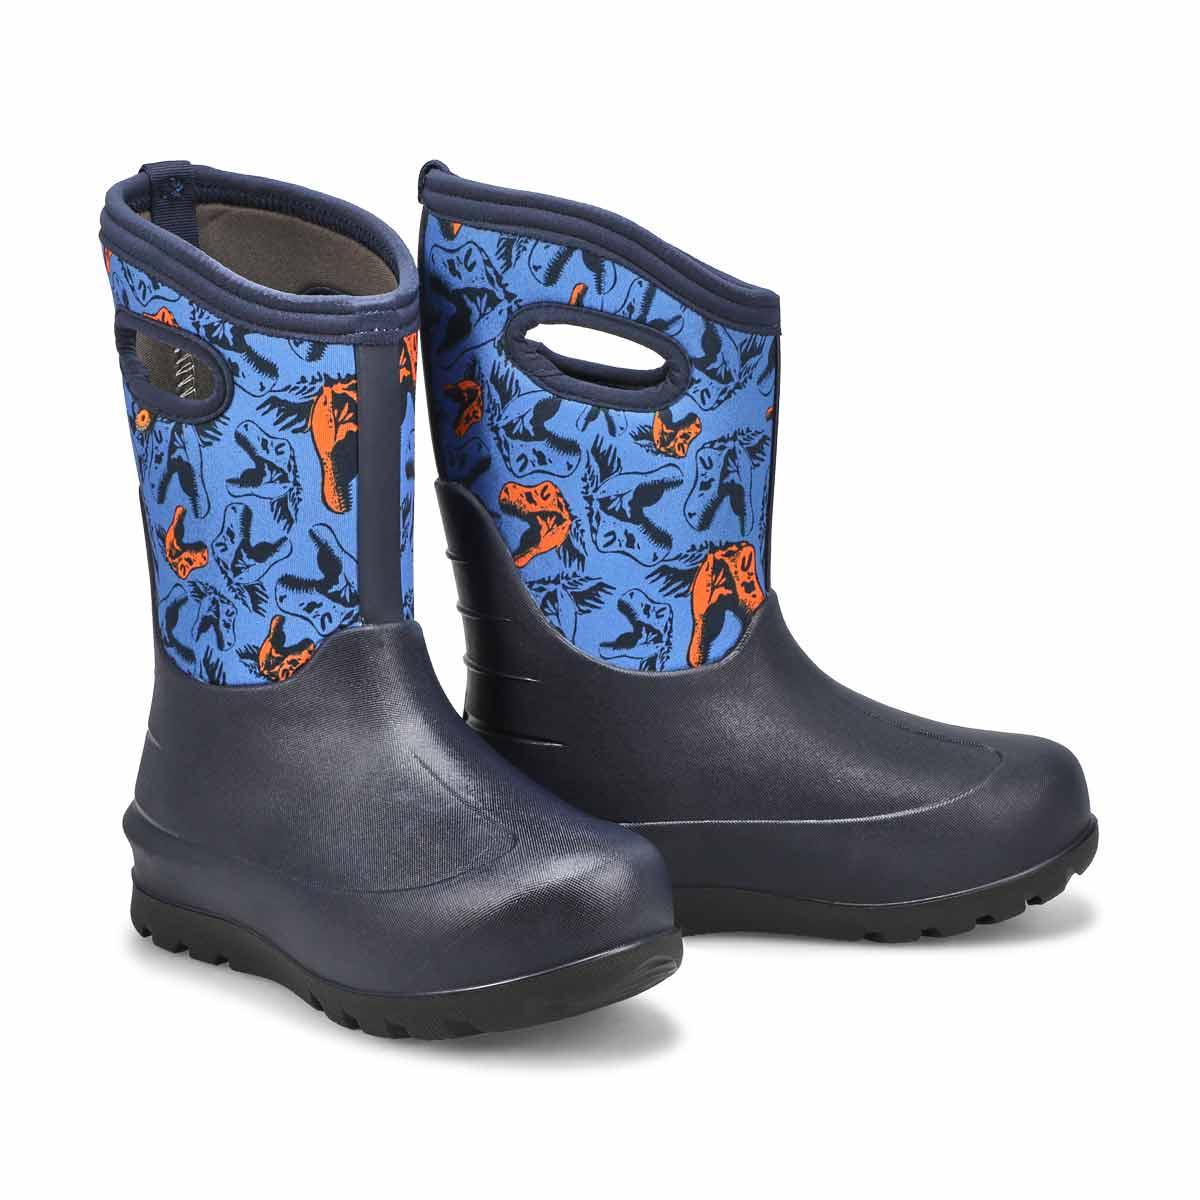 Boys' Neo-Classic Cool Dinos Waterproof Boot